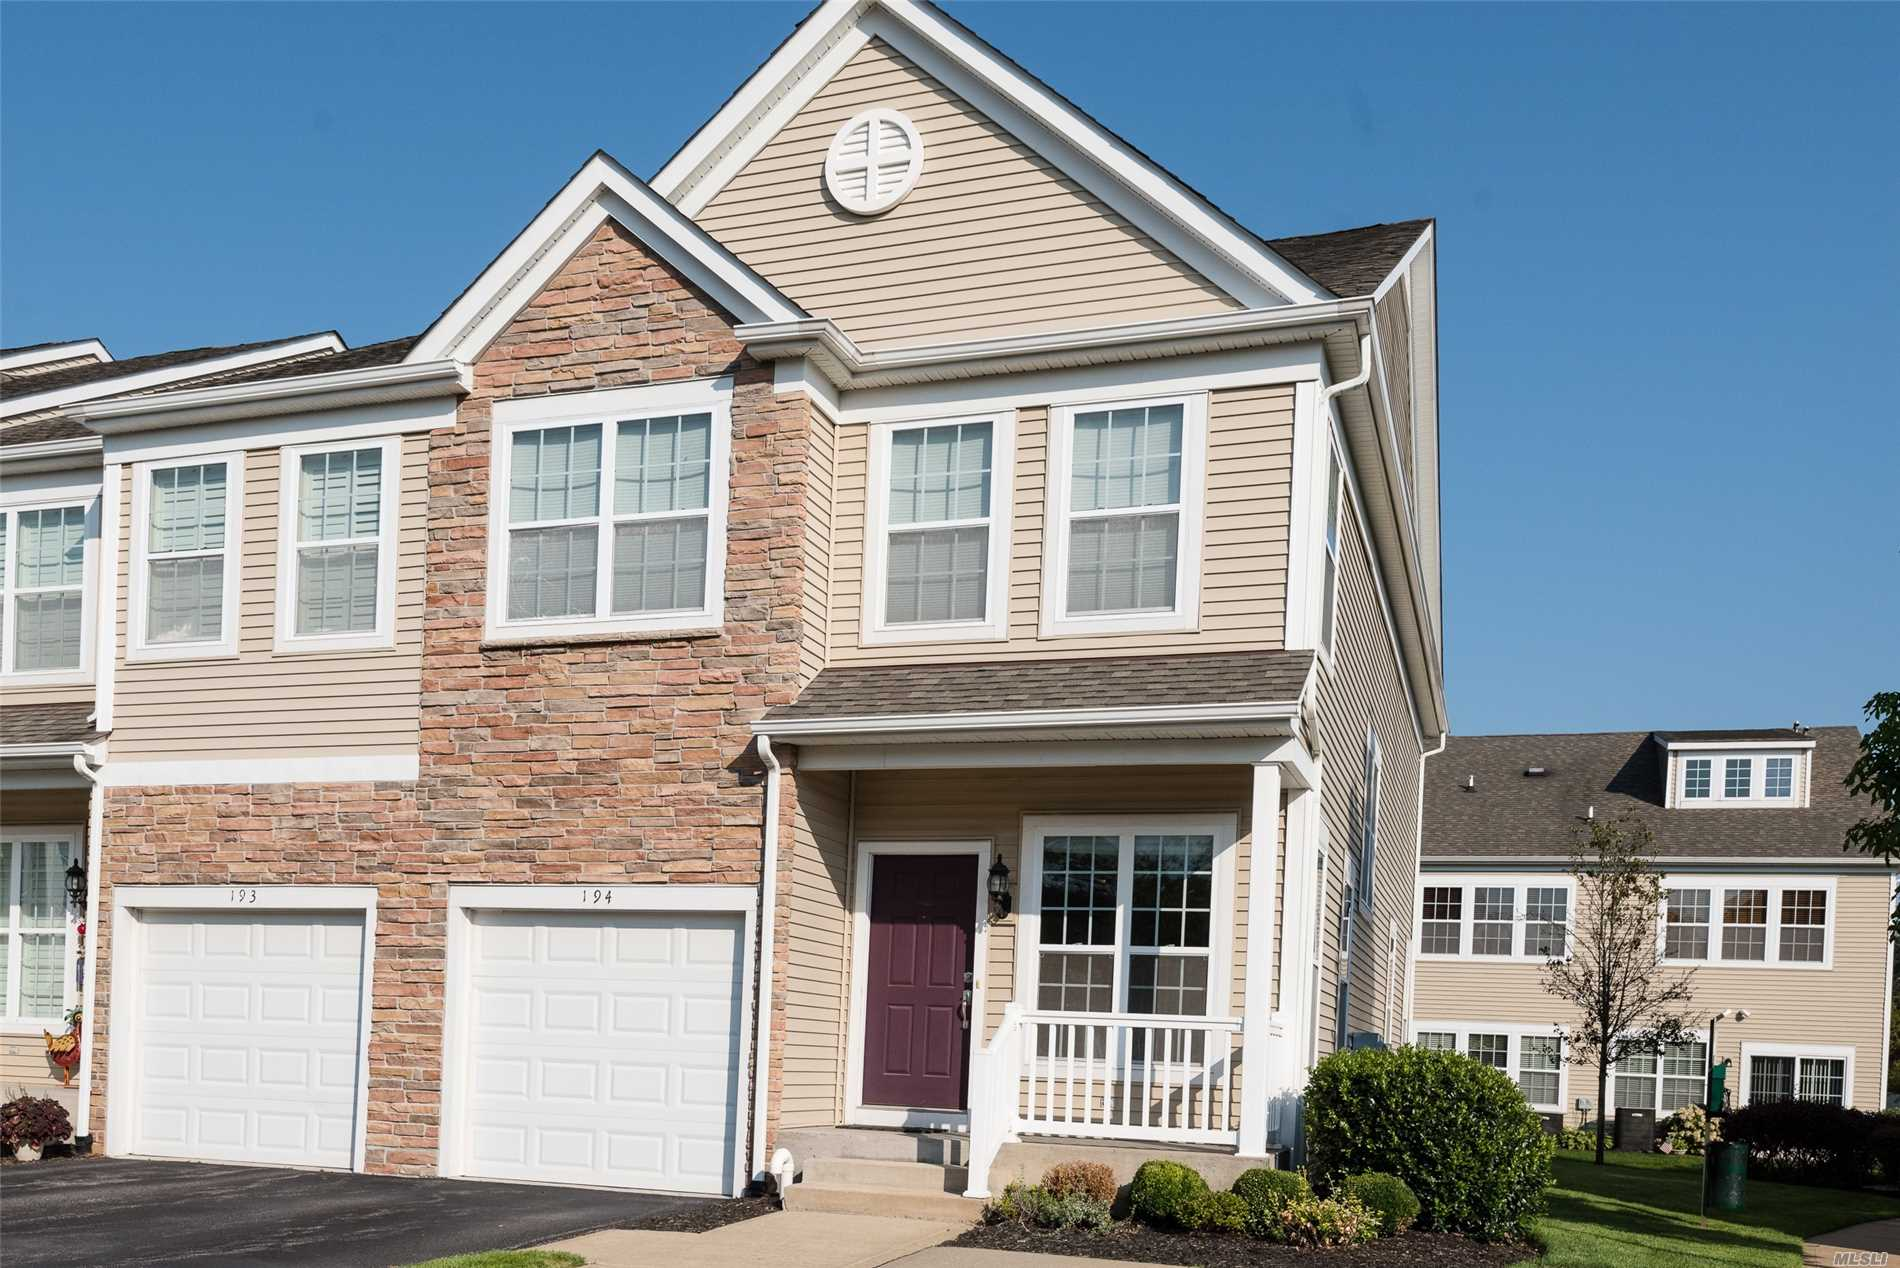 Property for sale at 194 Somerset Dr, Massapequa,  NY 11758